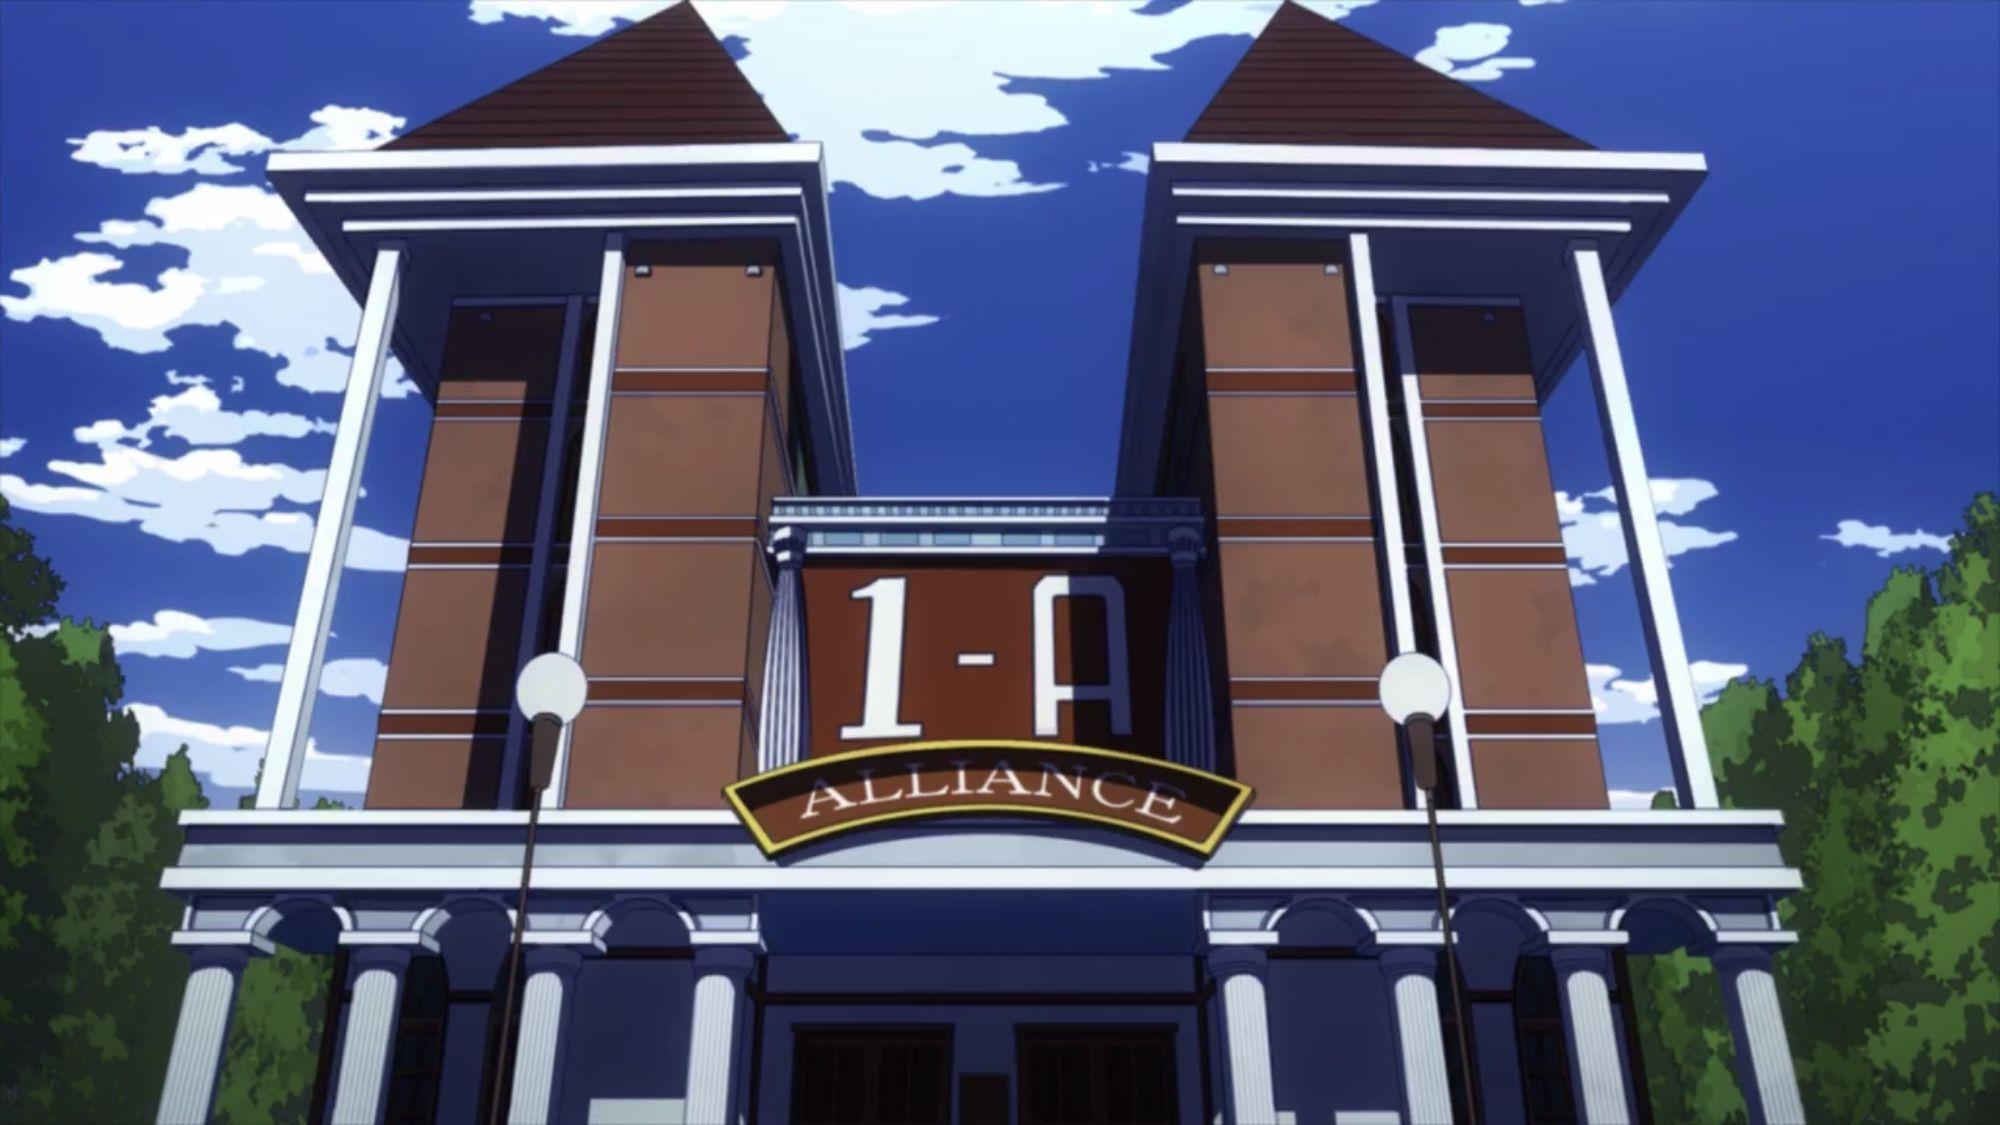 Pin By J T On My Hero Academia Dream Anime Anime Scenery My Hero Academia Manga